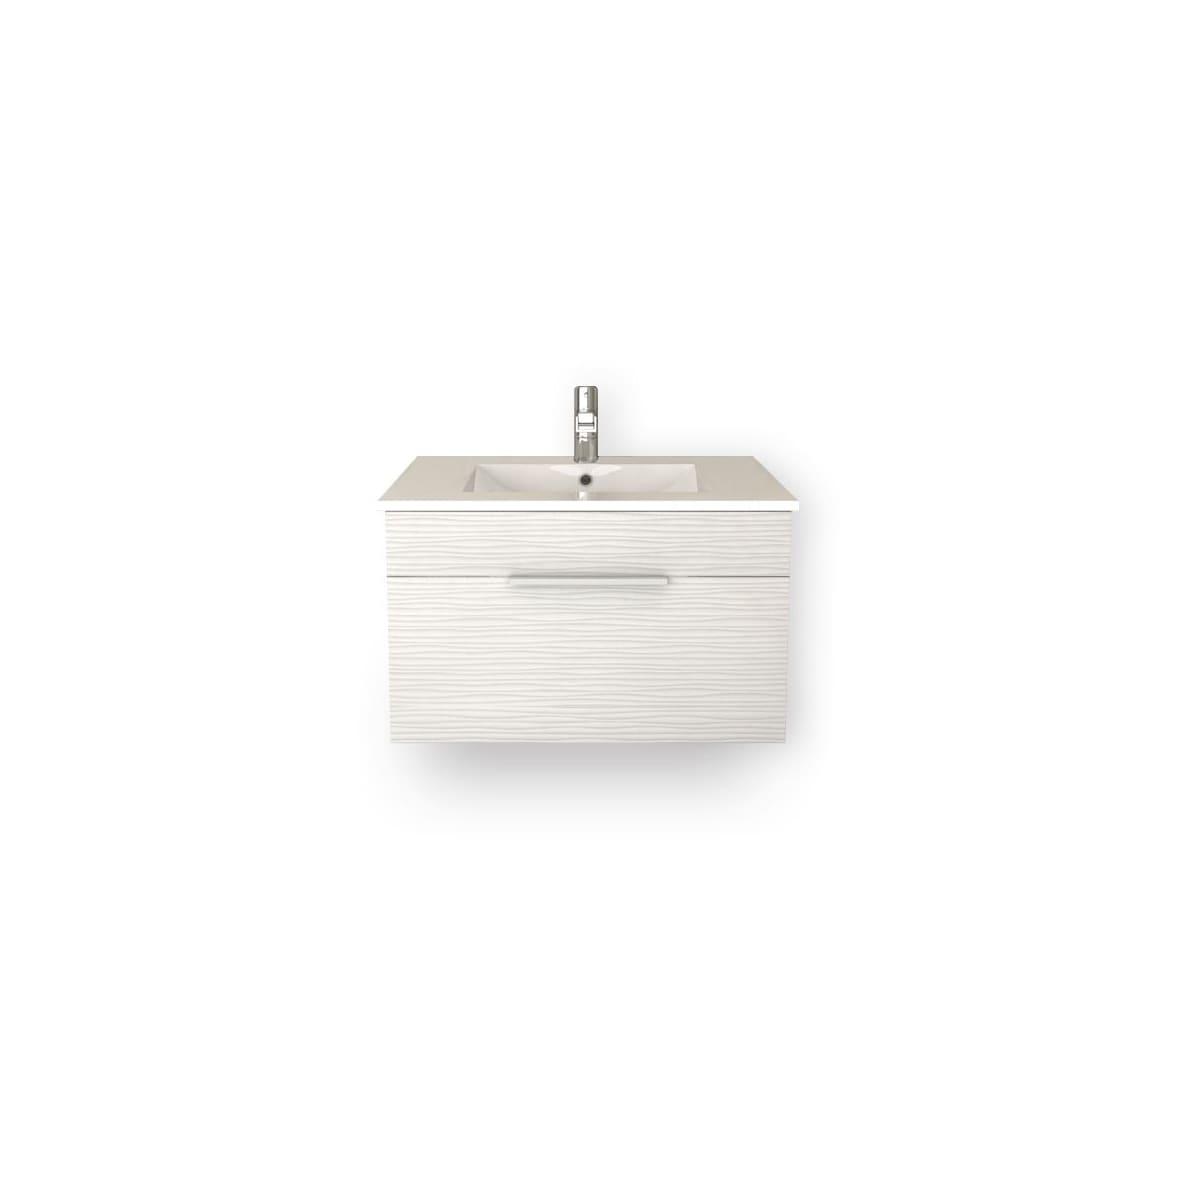 Cutler Kitchen And Bath Fv Cw30 Textures 30 Build Com